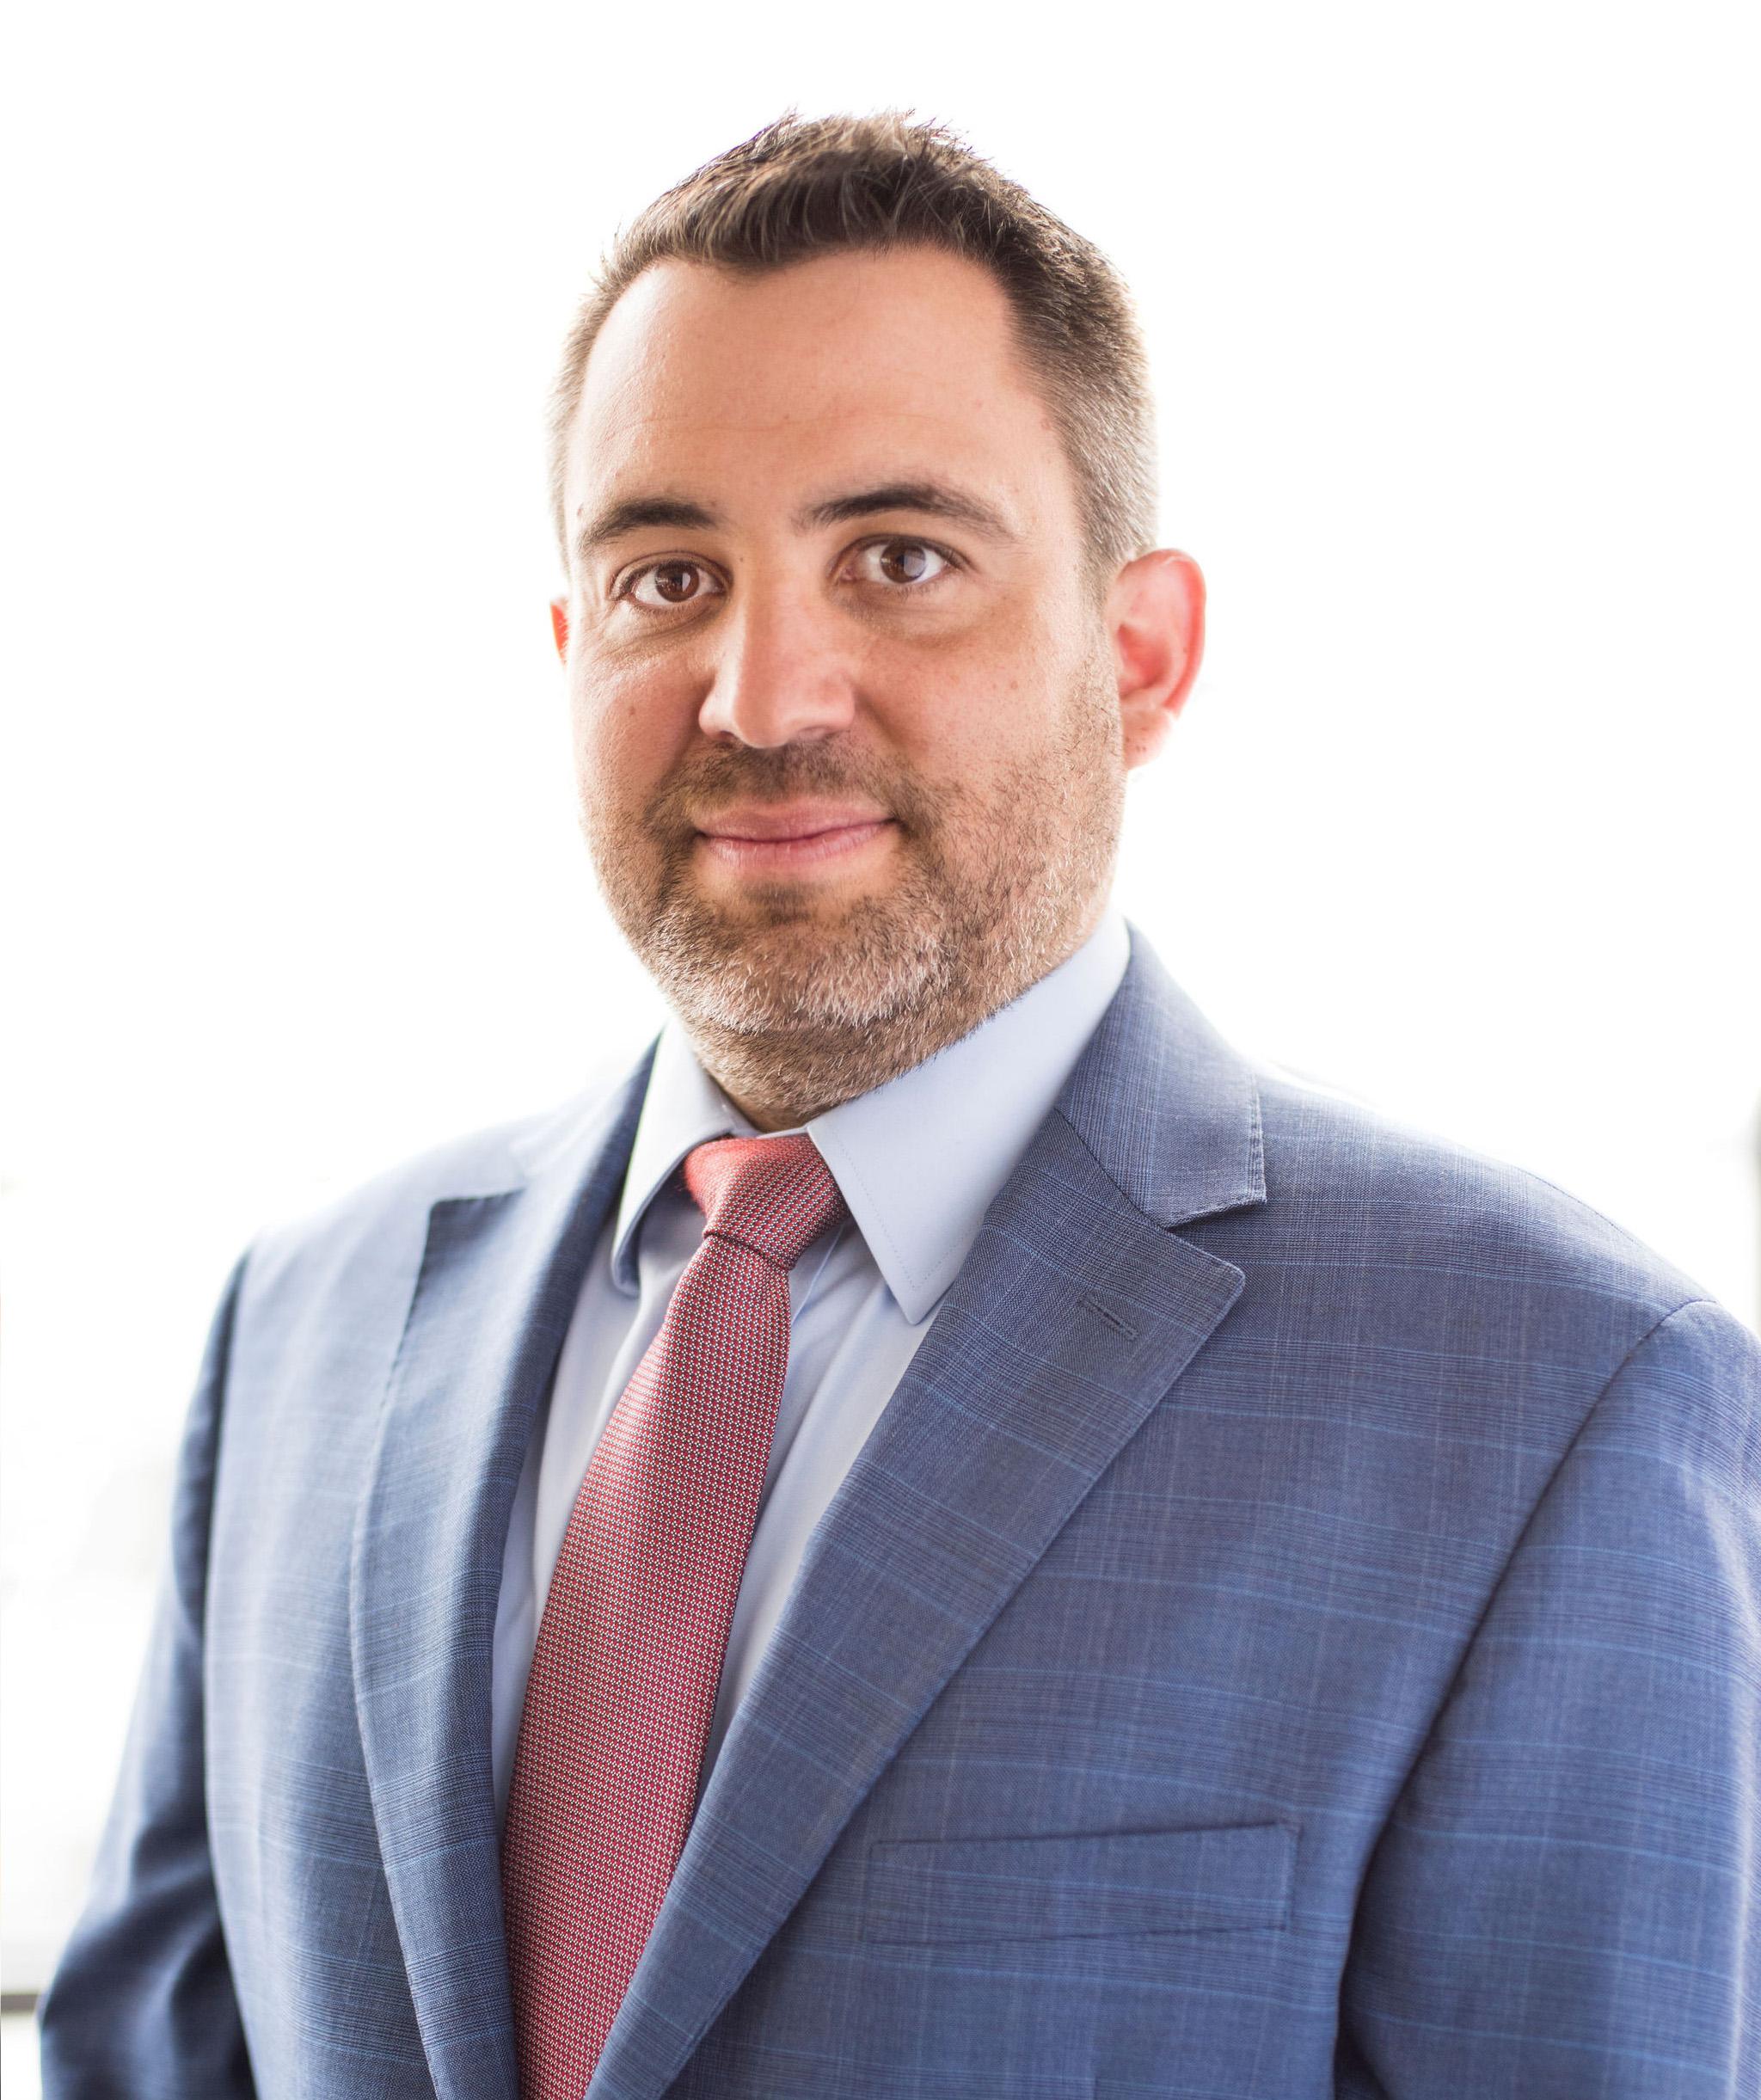 Josh Amos attorney Mcdermott stuart and ward